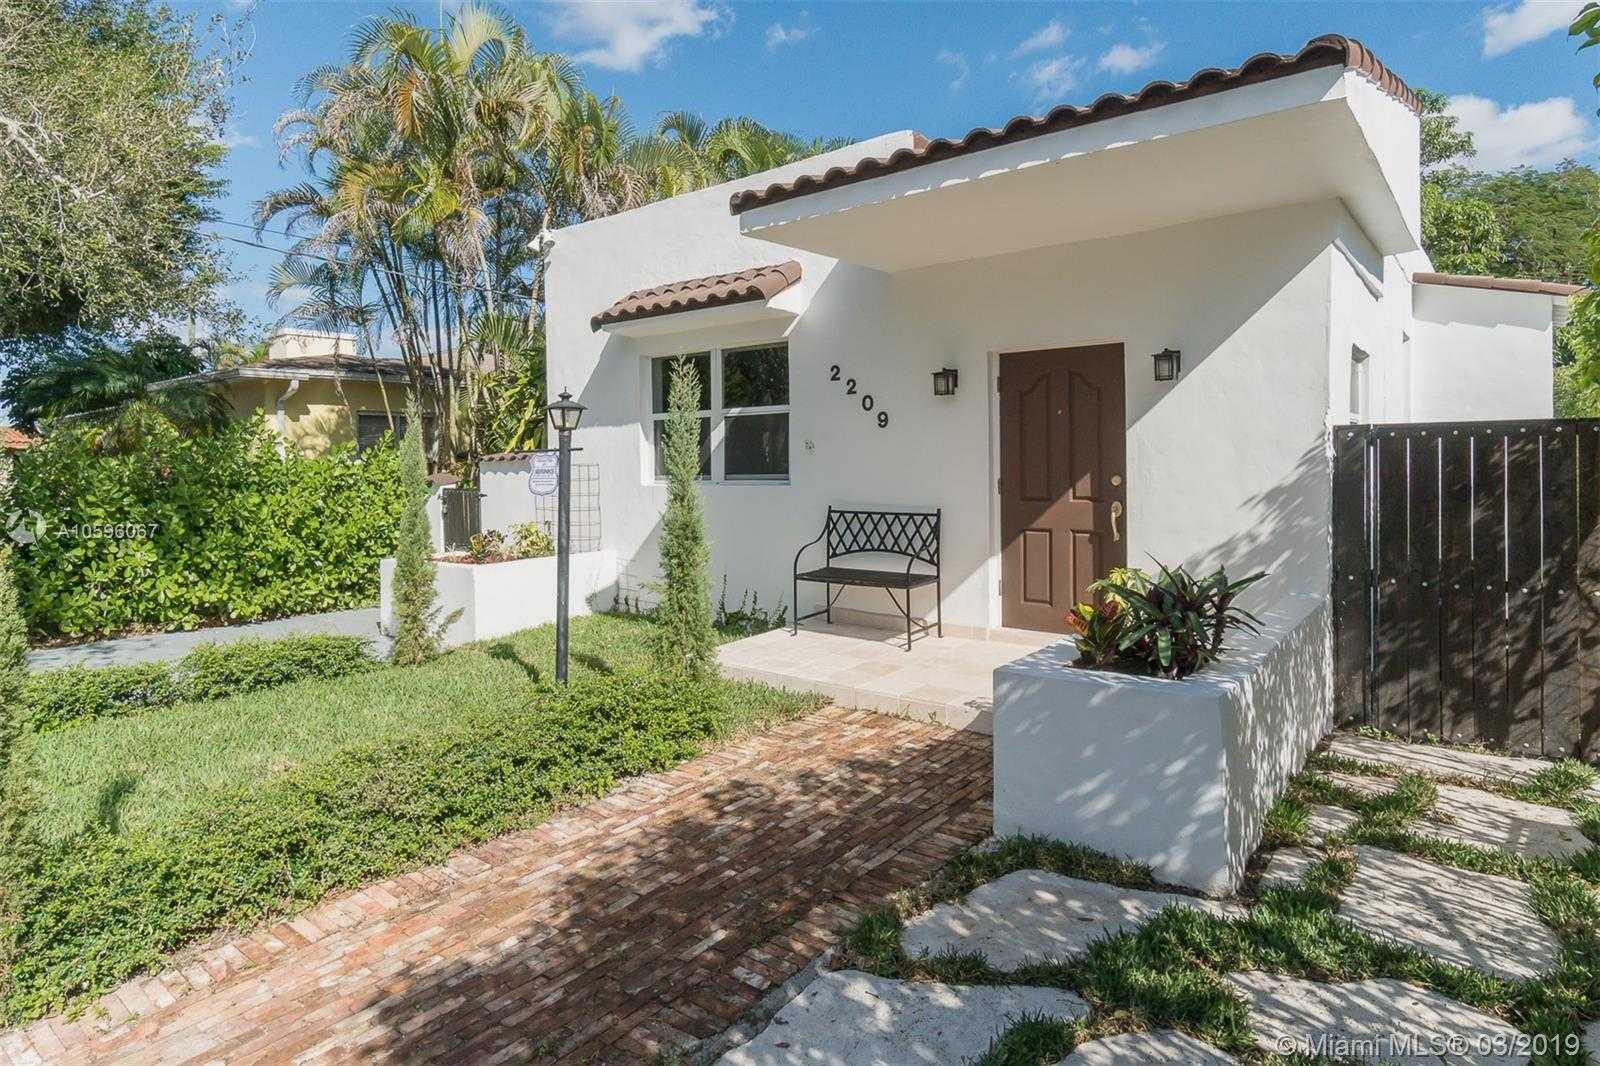 Brilliant Historic Miami Homes For Sale Metro City Realty Home Interior And Landscaping Ponolsignezvosmurscom